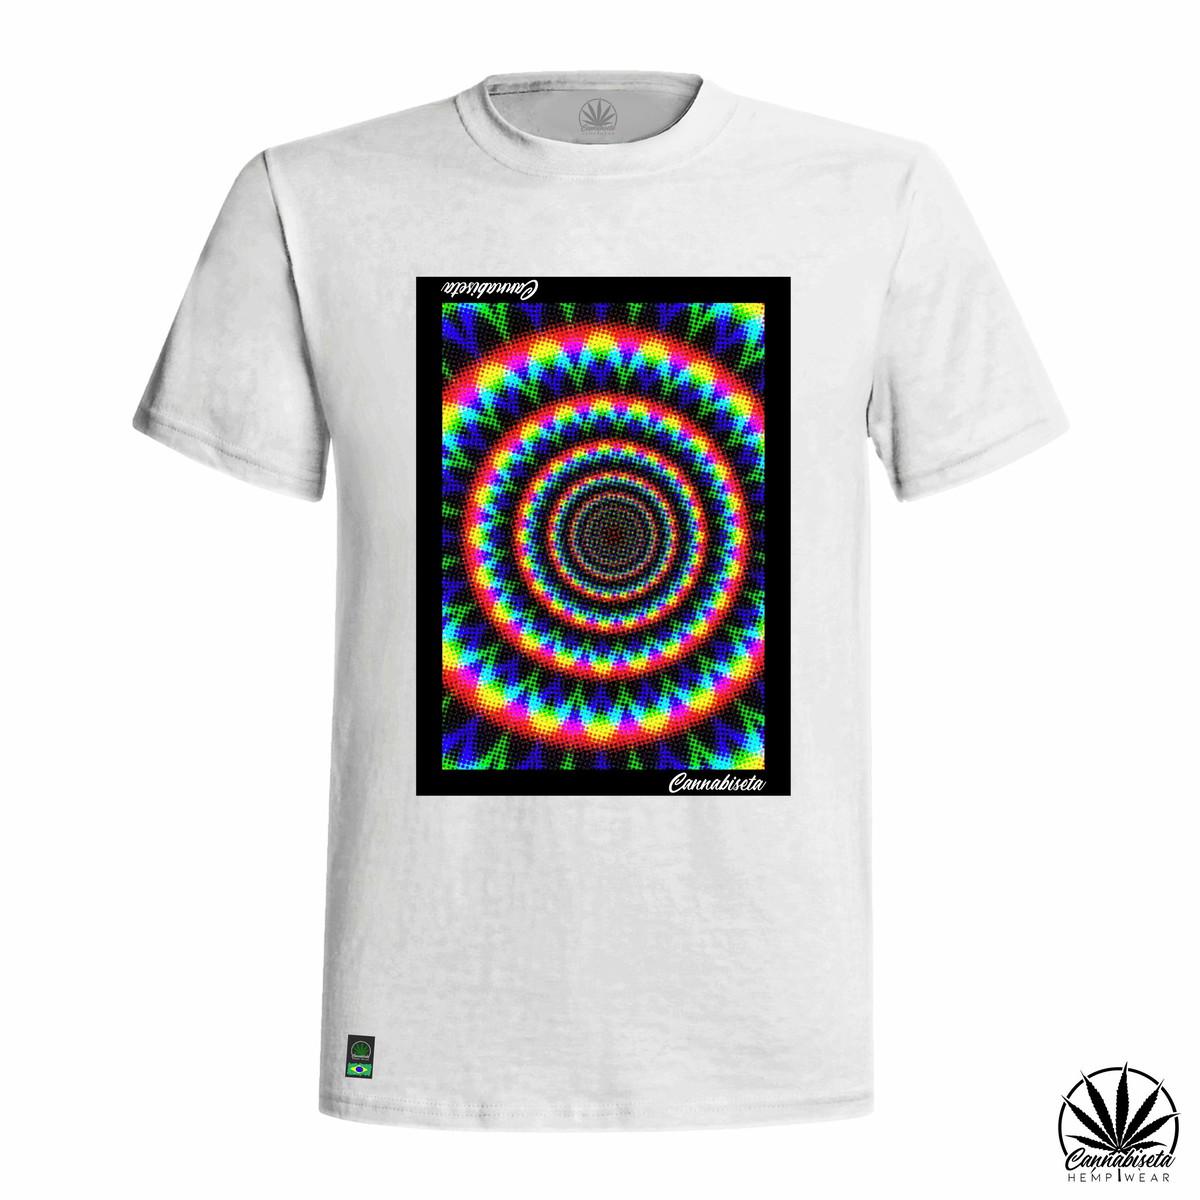 Camiseta Portal Psicodelico No Elo7 Cannabiseta Hemp Wear Store 12bc748